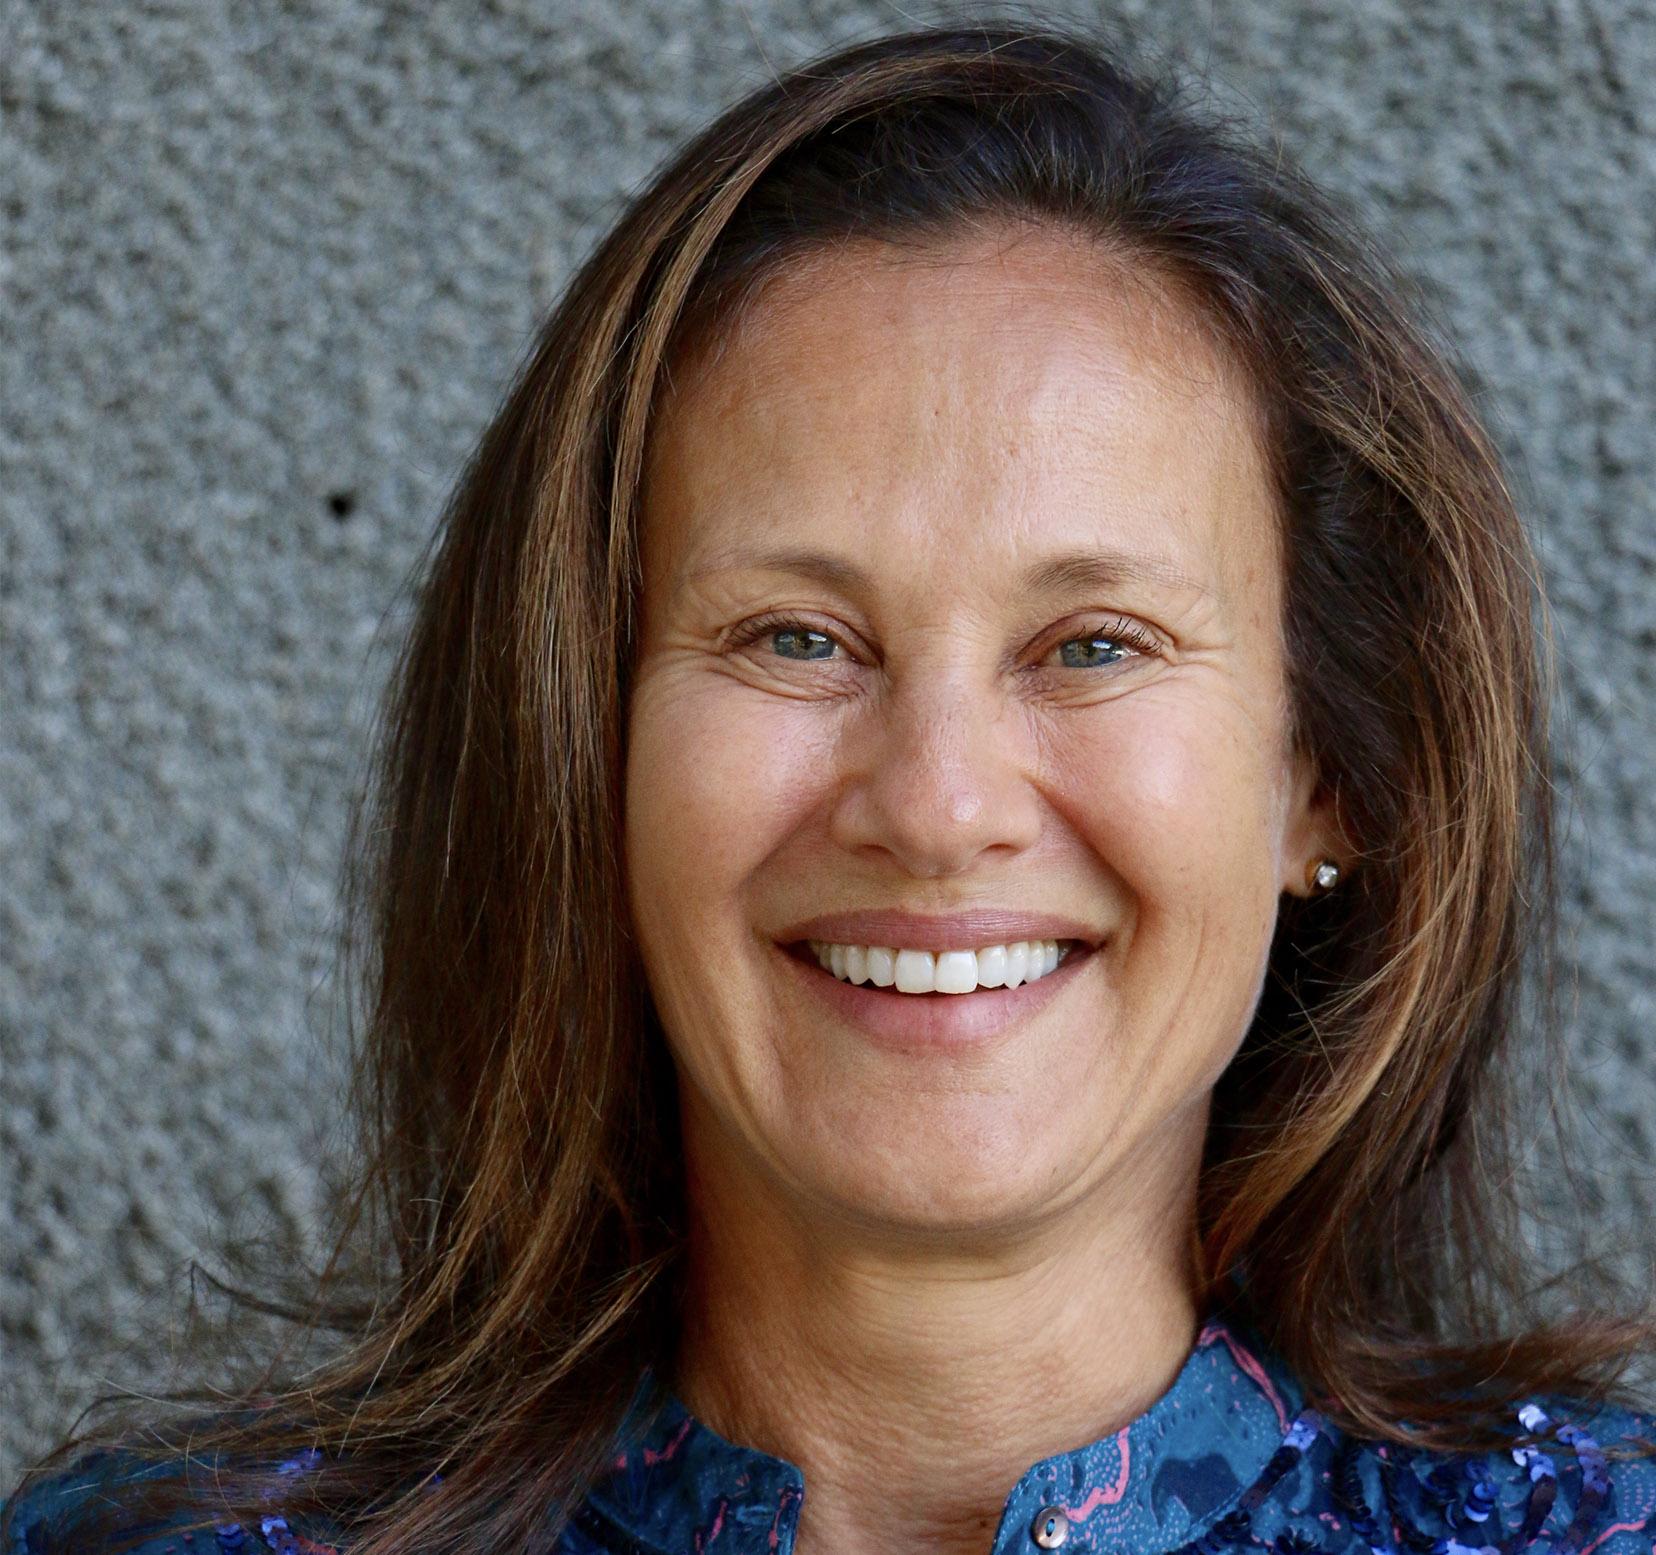 ANDREA KERZNER Founder of Lalela scarf